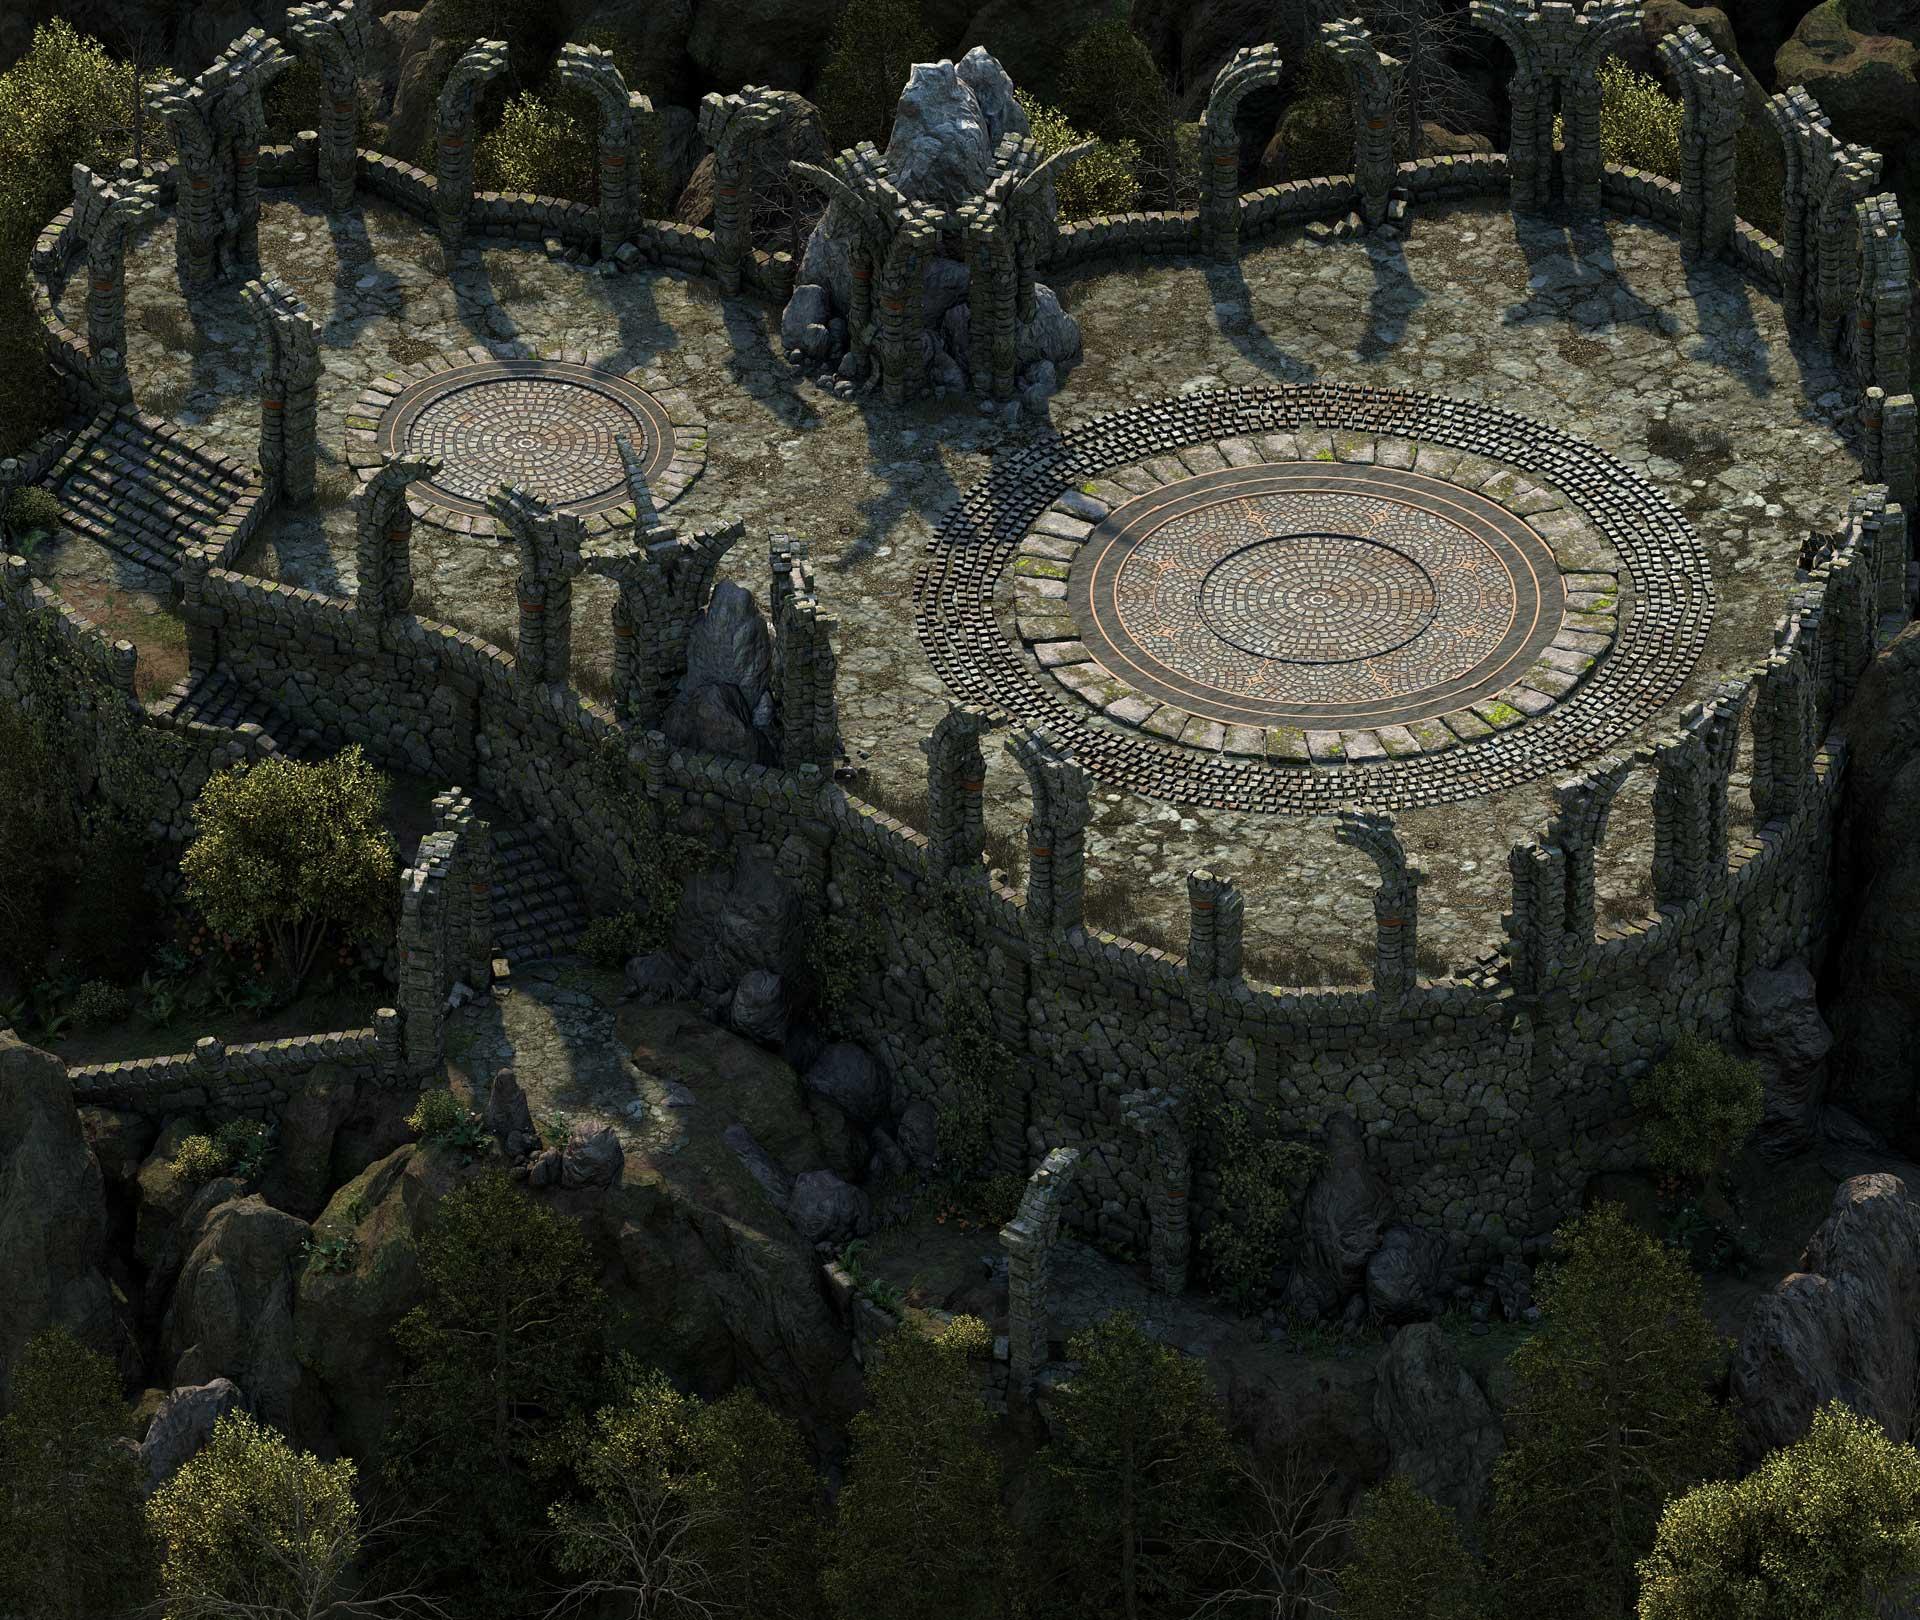 Pillars Of Eternity Karte.Pillars Of Eternity Zobacz Kartę Postaci Z Rpg A Studia Obsidian